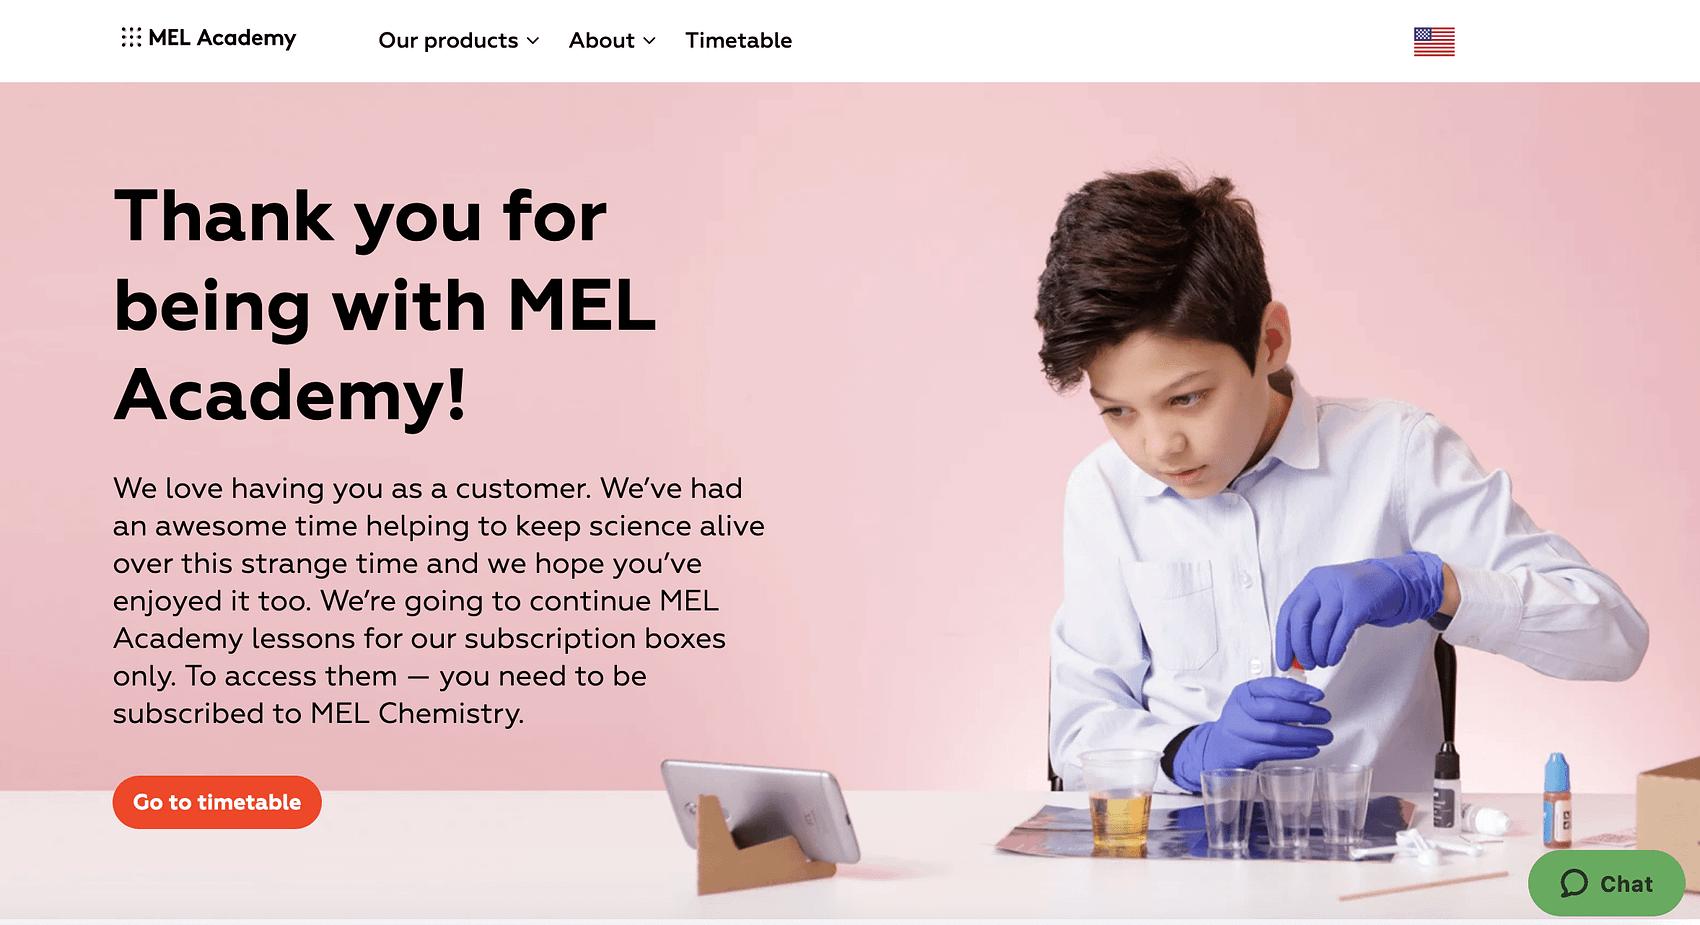 MEL Academy- MEL Chemistry subscription